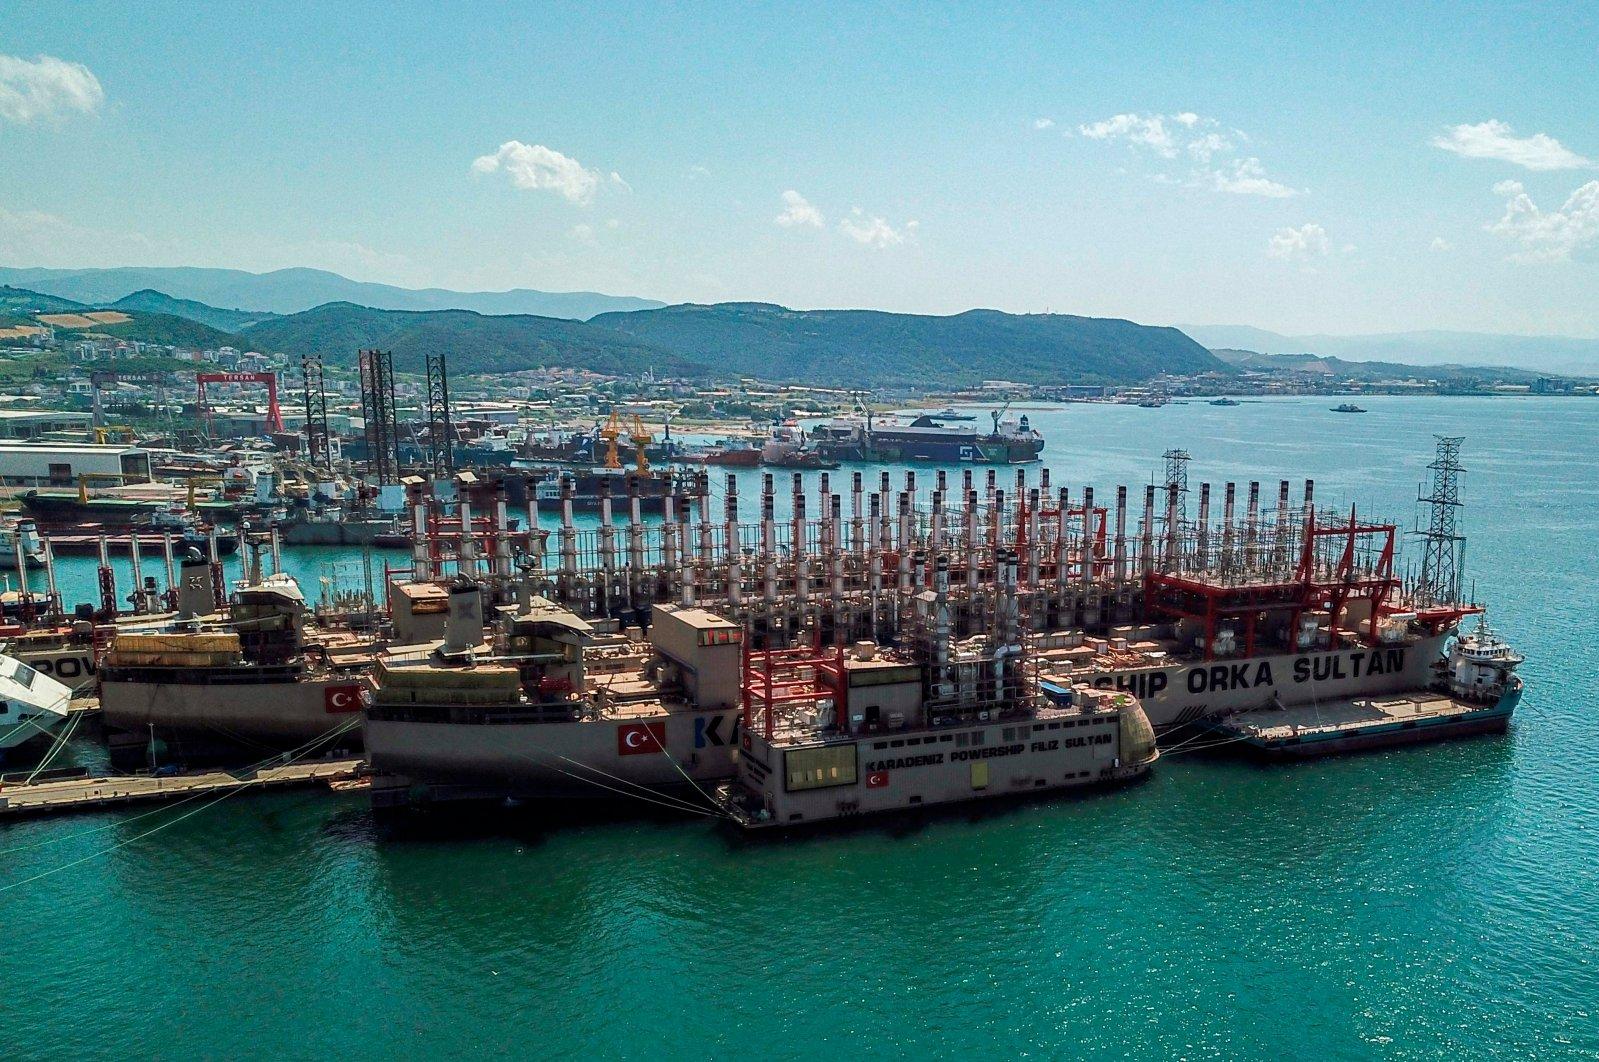 Two Turkish powerships are seen docked in a shipyard in Yalova's Altınova district, Turkey, June 16, 2020. (AFP Photo)